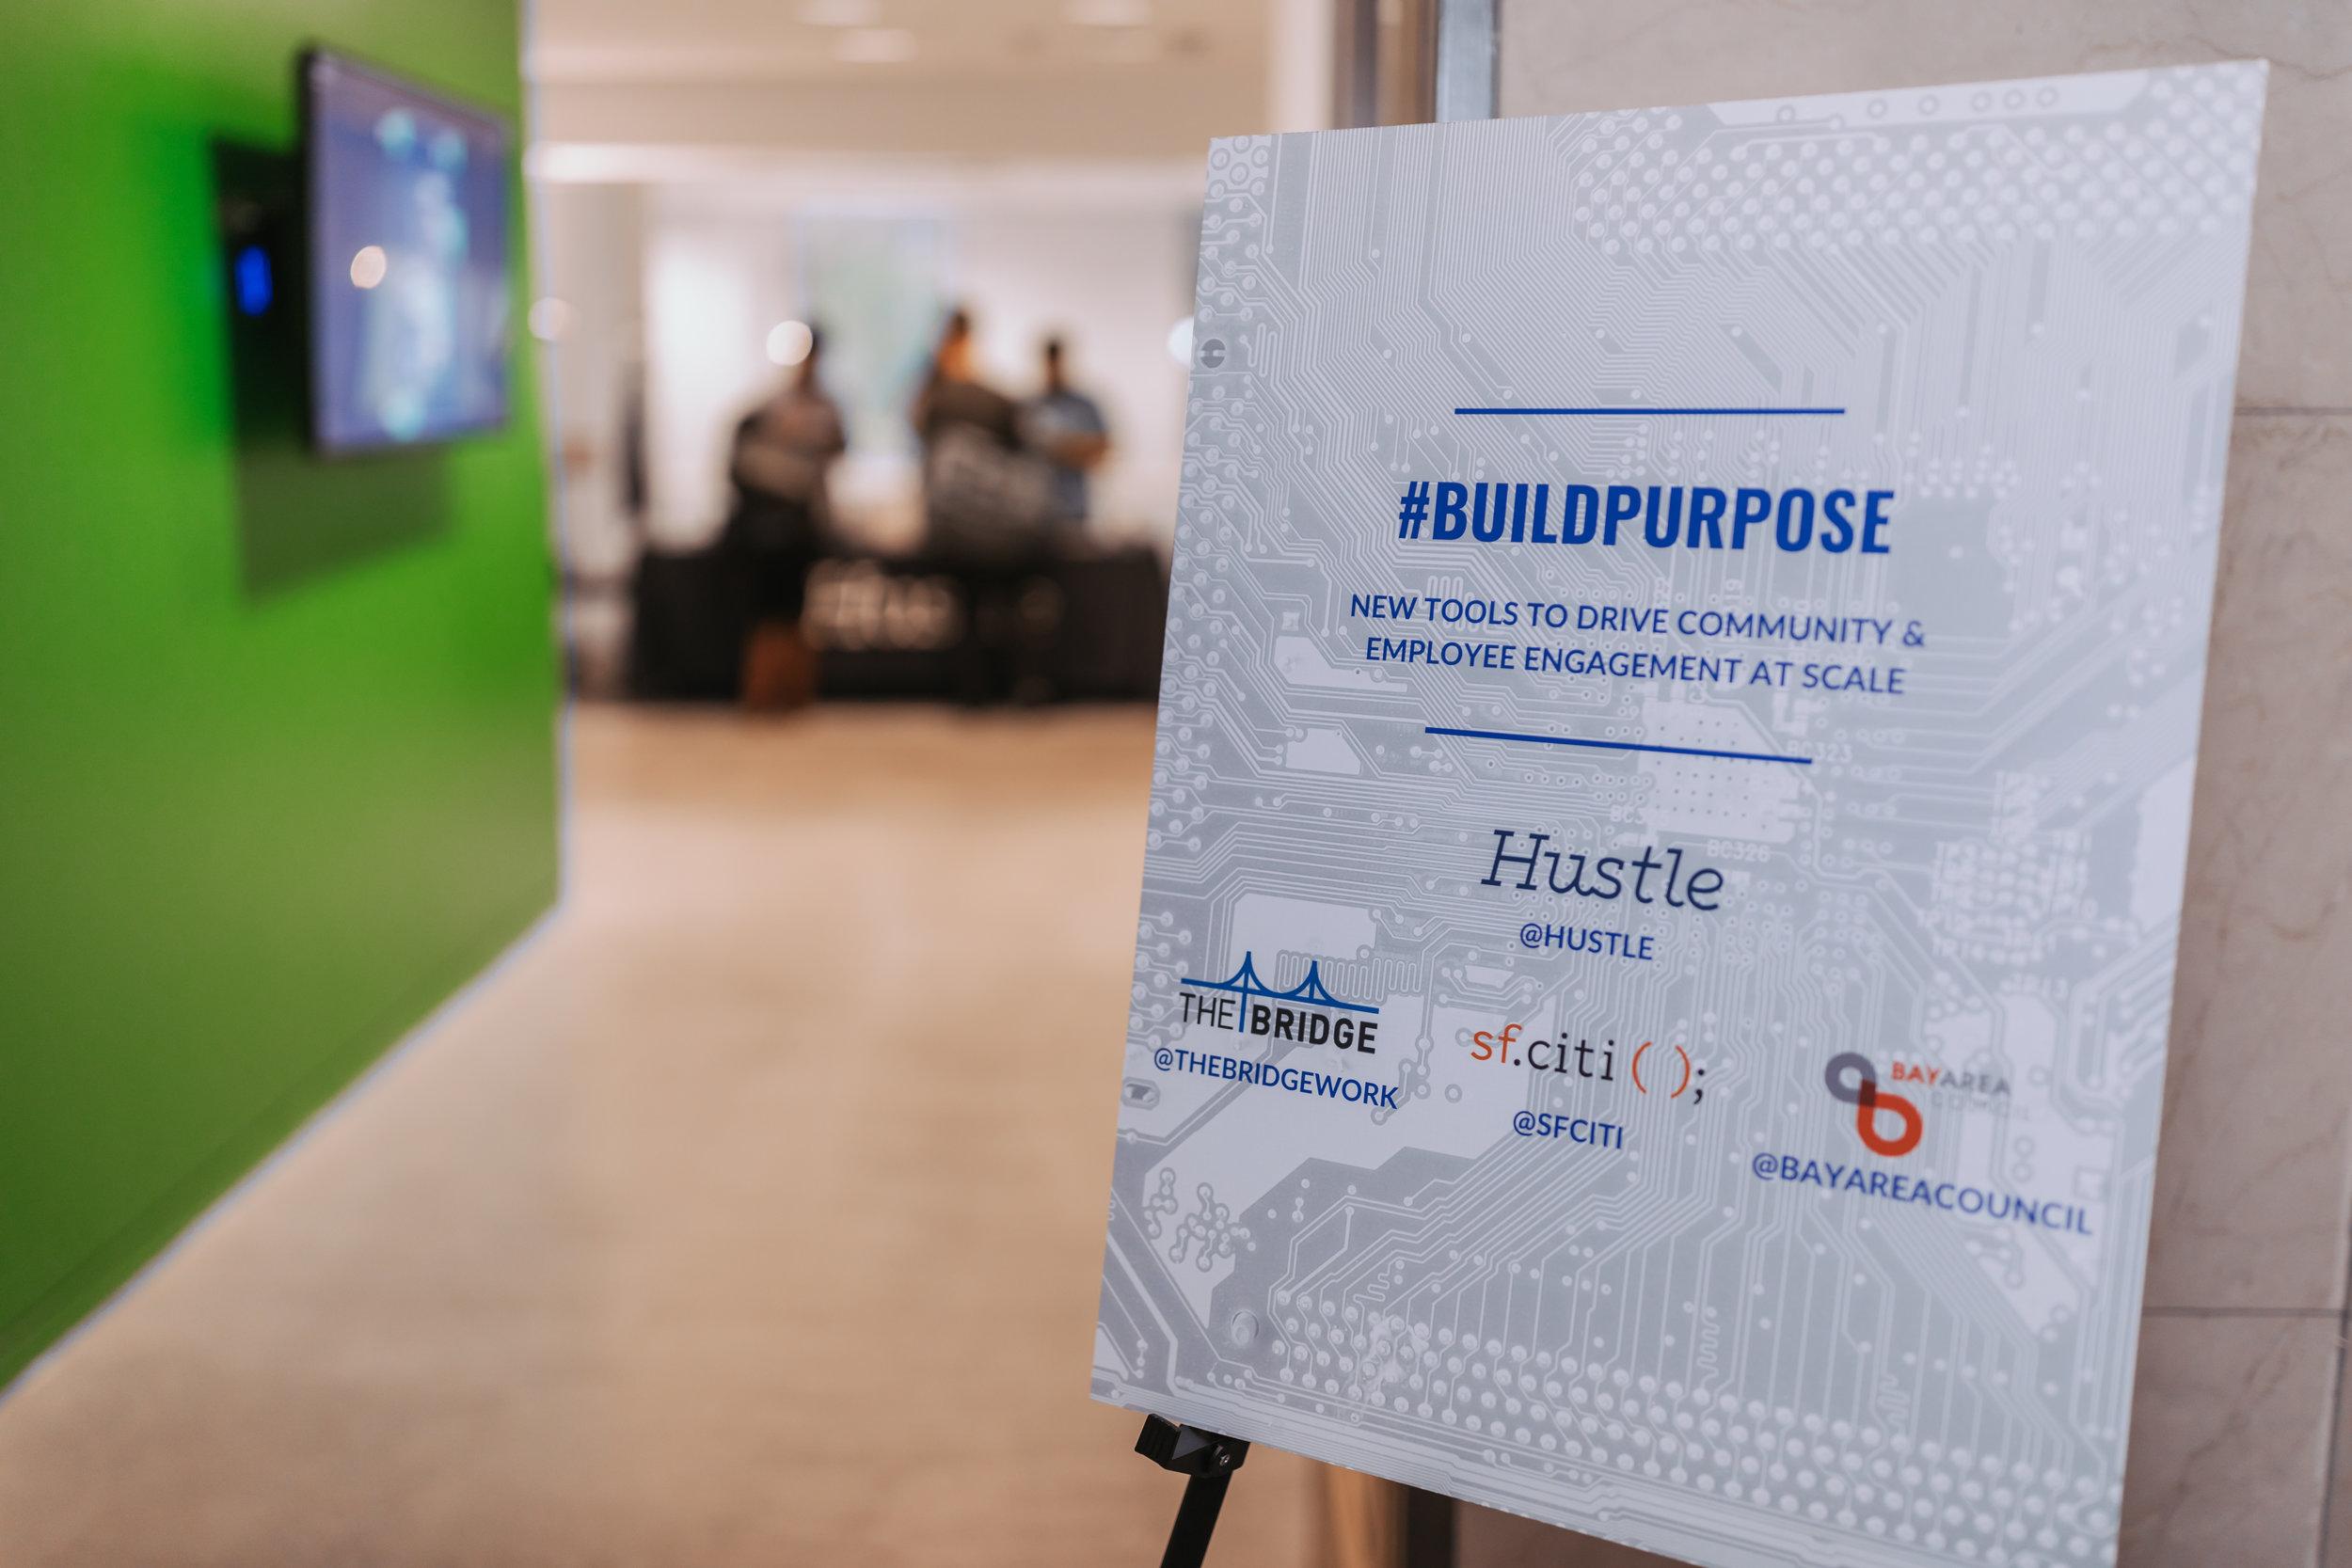 poster2018-08-16_ROEDER_Hustle-BuildingCompaniesWithPurpose_CARD2_0006.jpg